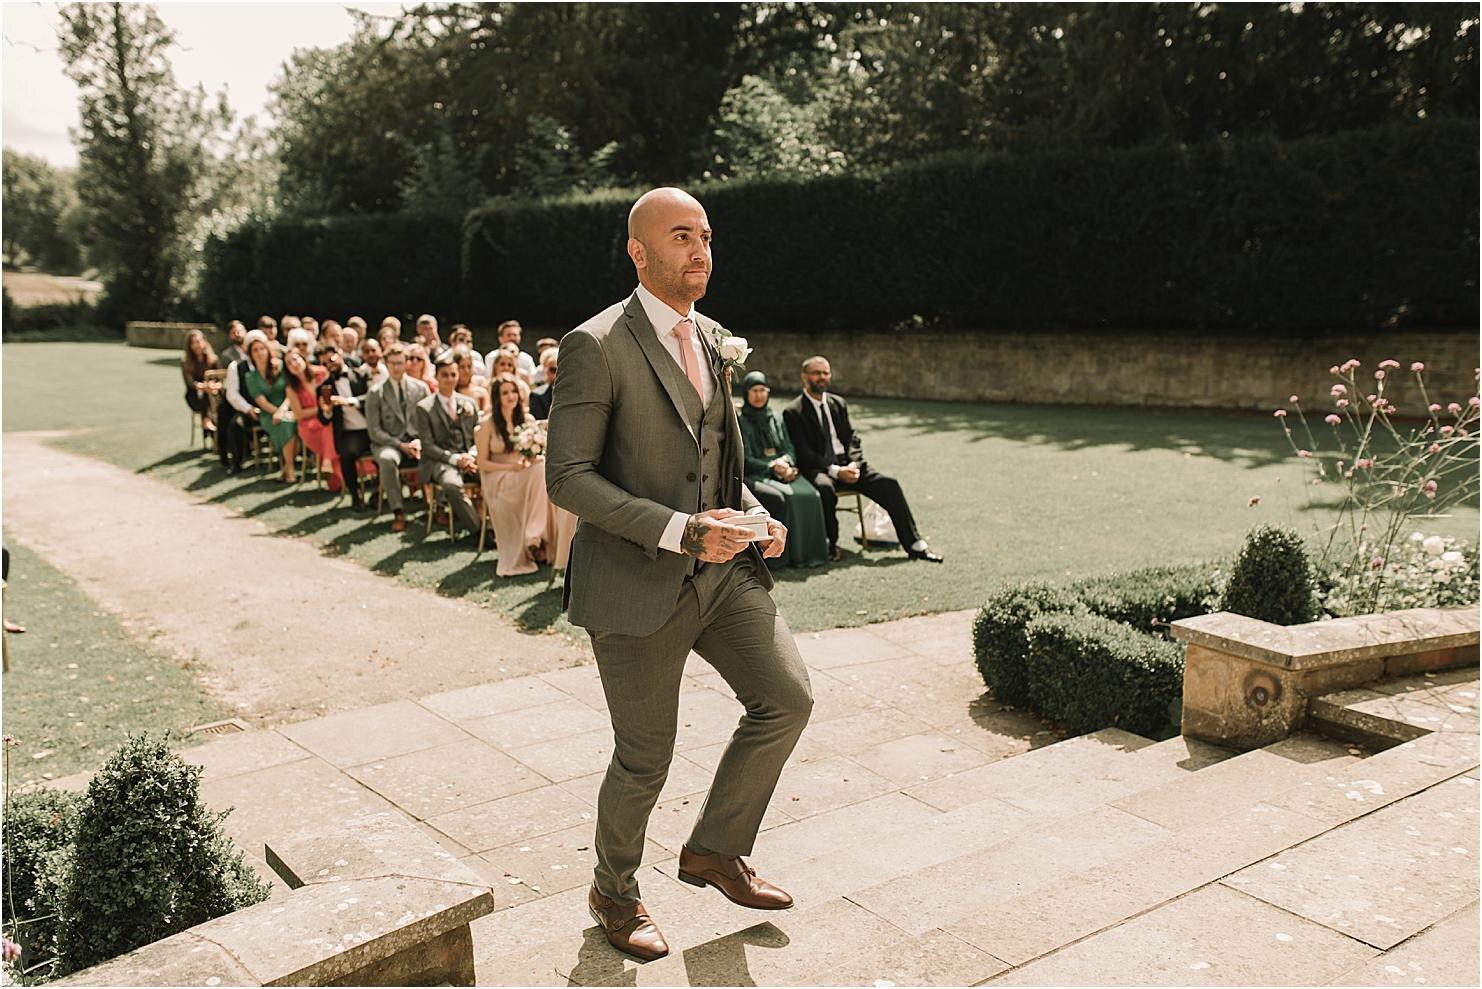 boda-de-cuento-en-castillo-boda-en-londres-53.jpg